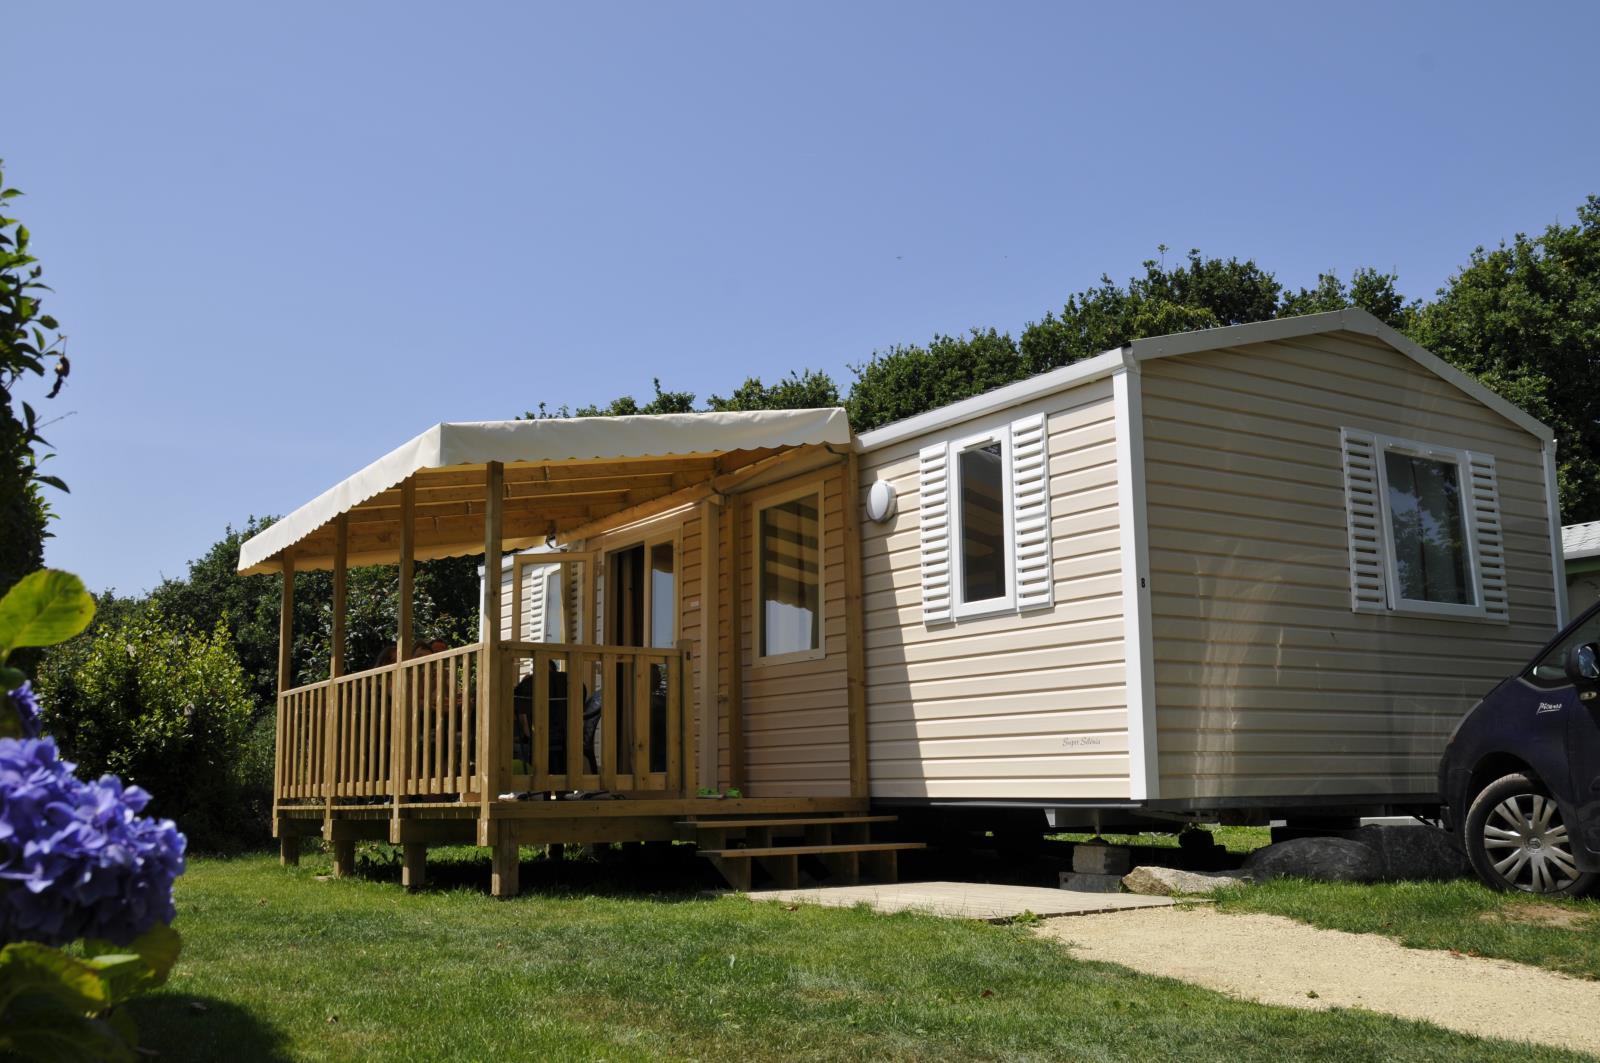 Location - Mobil-Home Selenia Premium 34M² (2 Chambres) + Terrasse Couverte 13.5M² - Arrivées Dim - Camping de Kerleyou